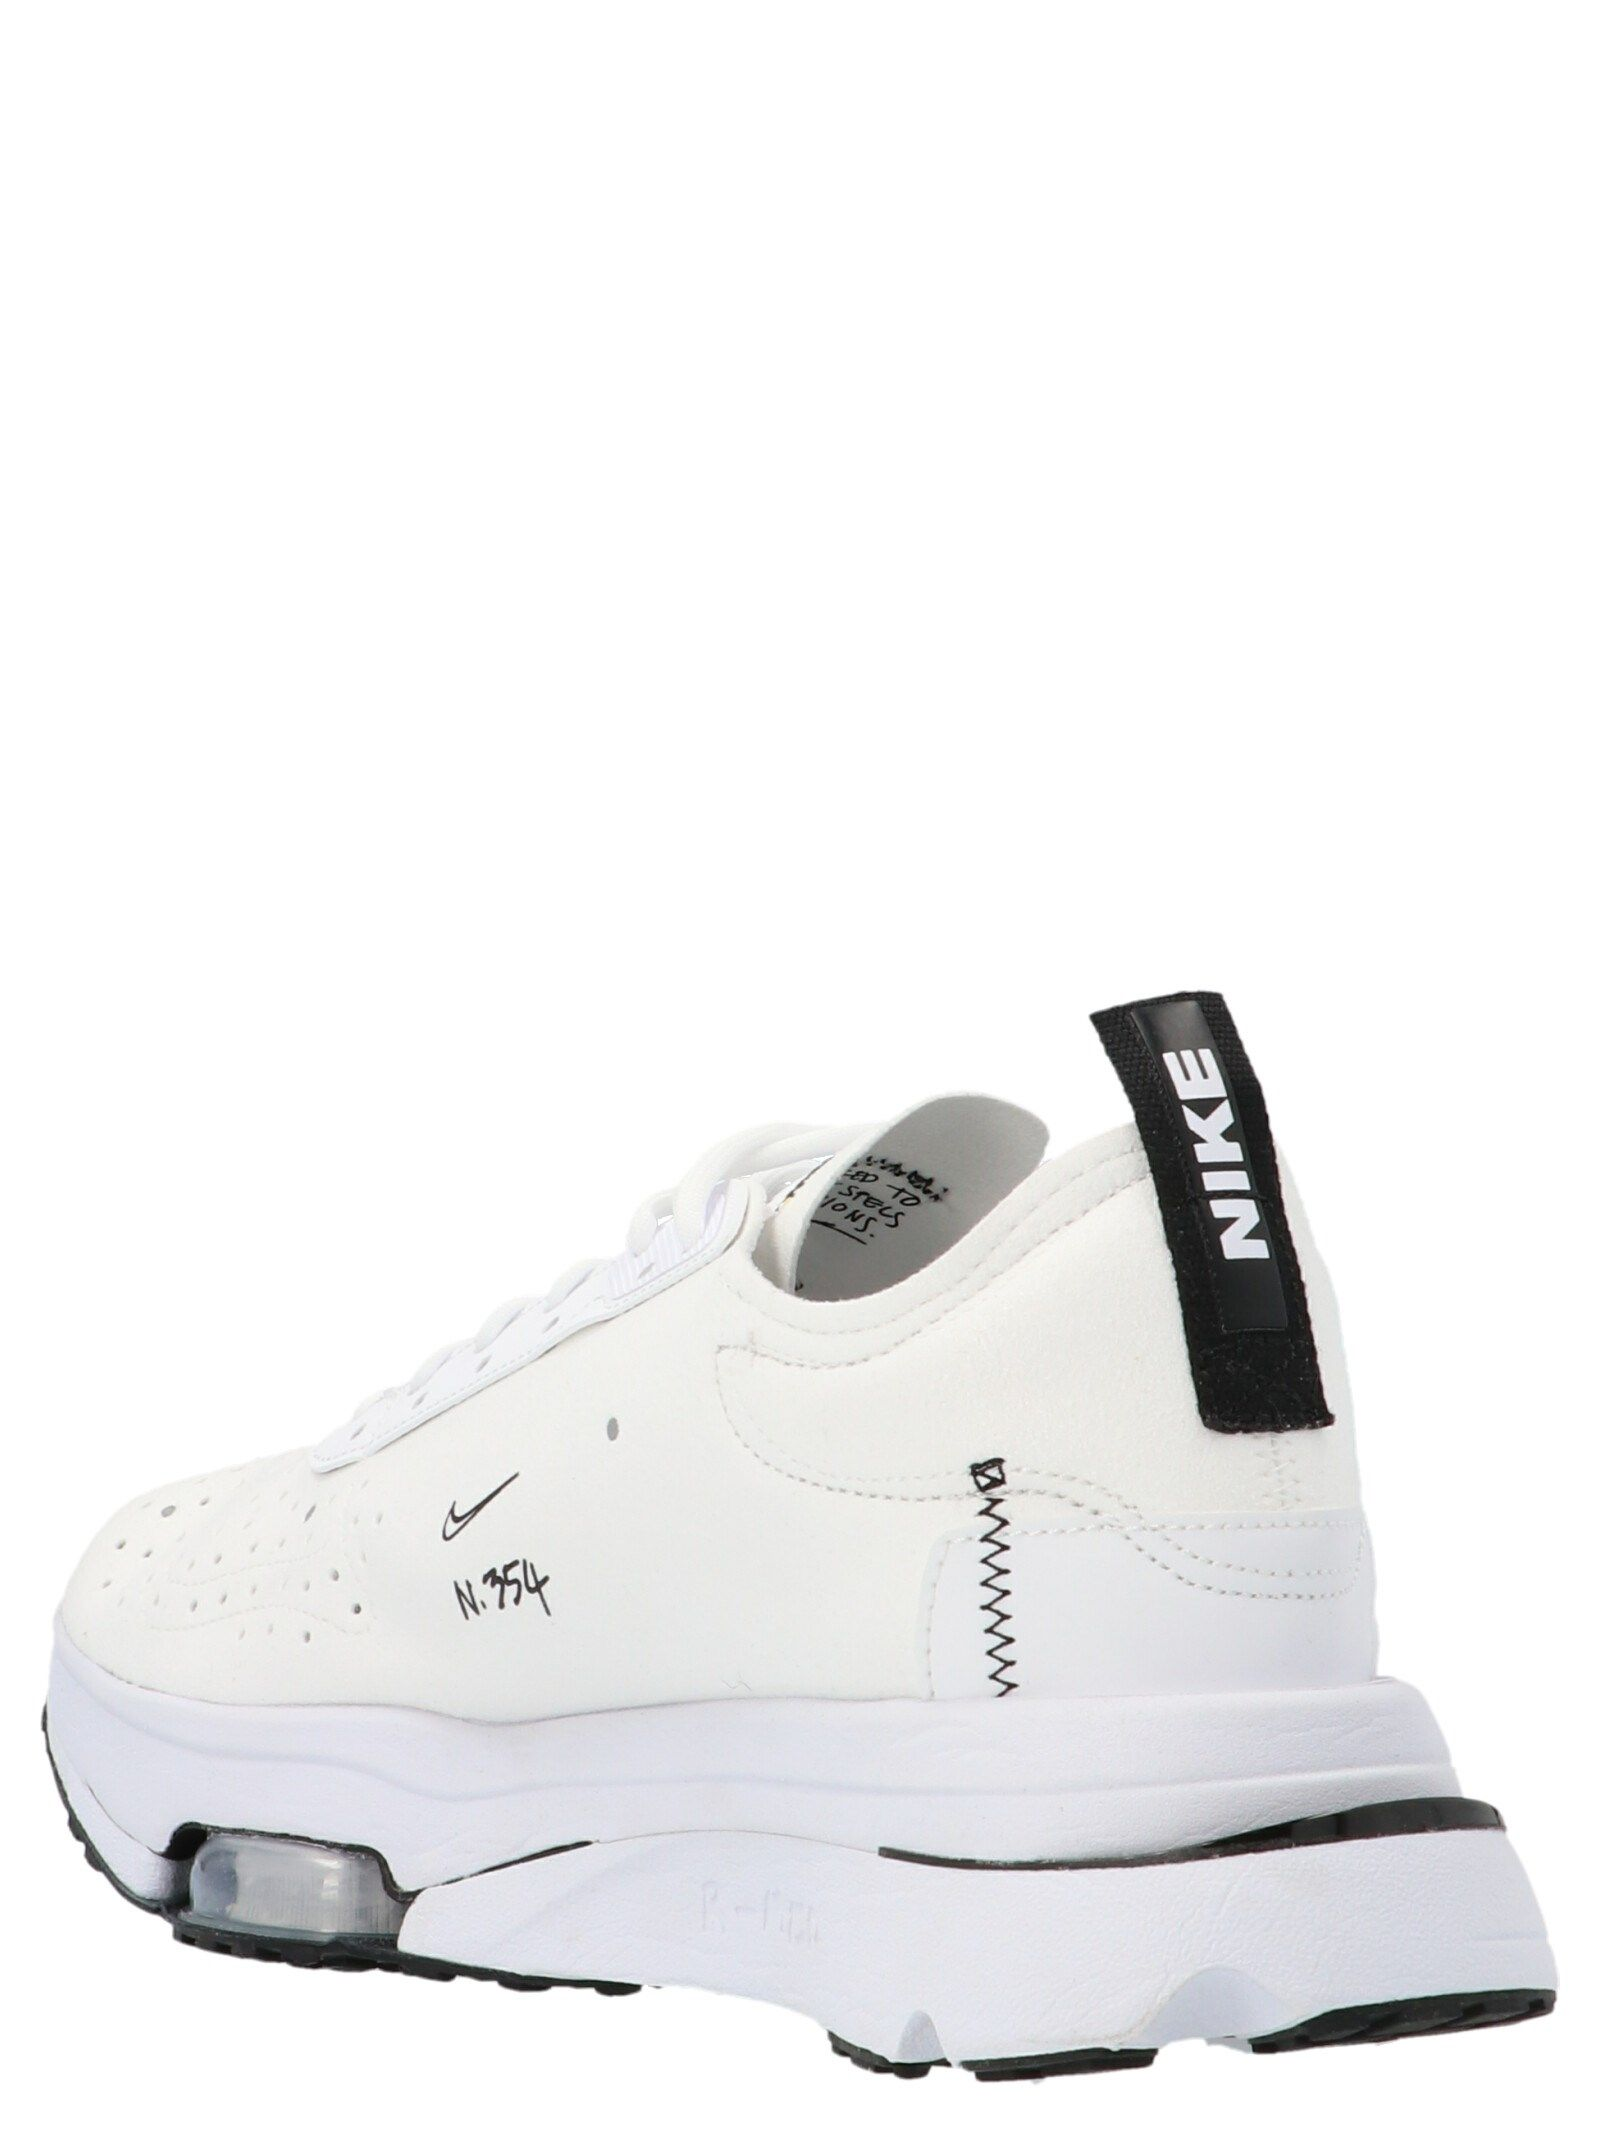 NIKE Sneakers NIKE MEN'S MULTICOLOR OTHER MATERIALS SNEAKERS